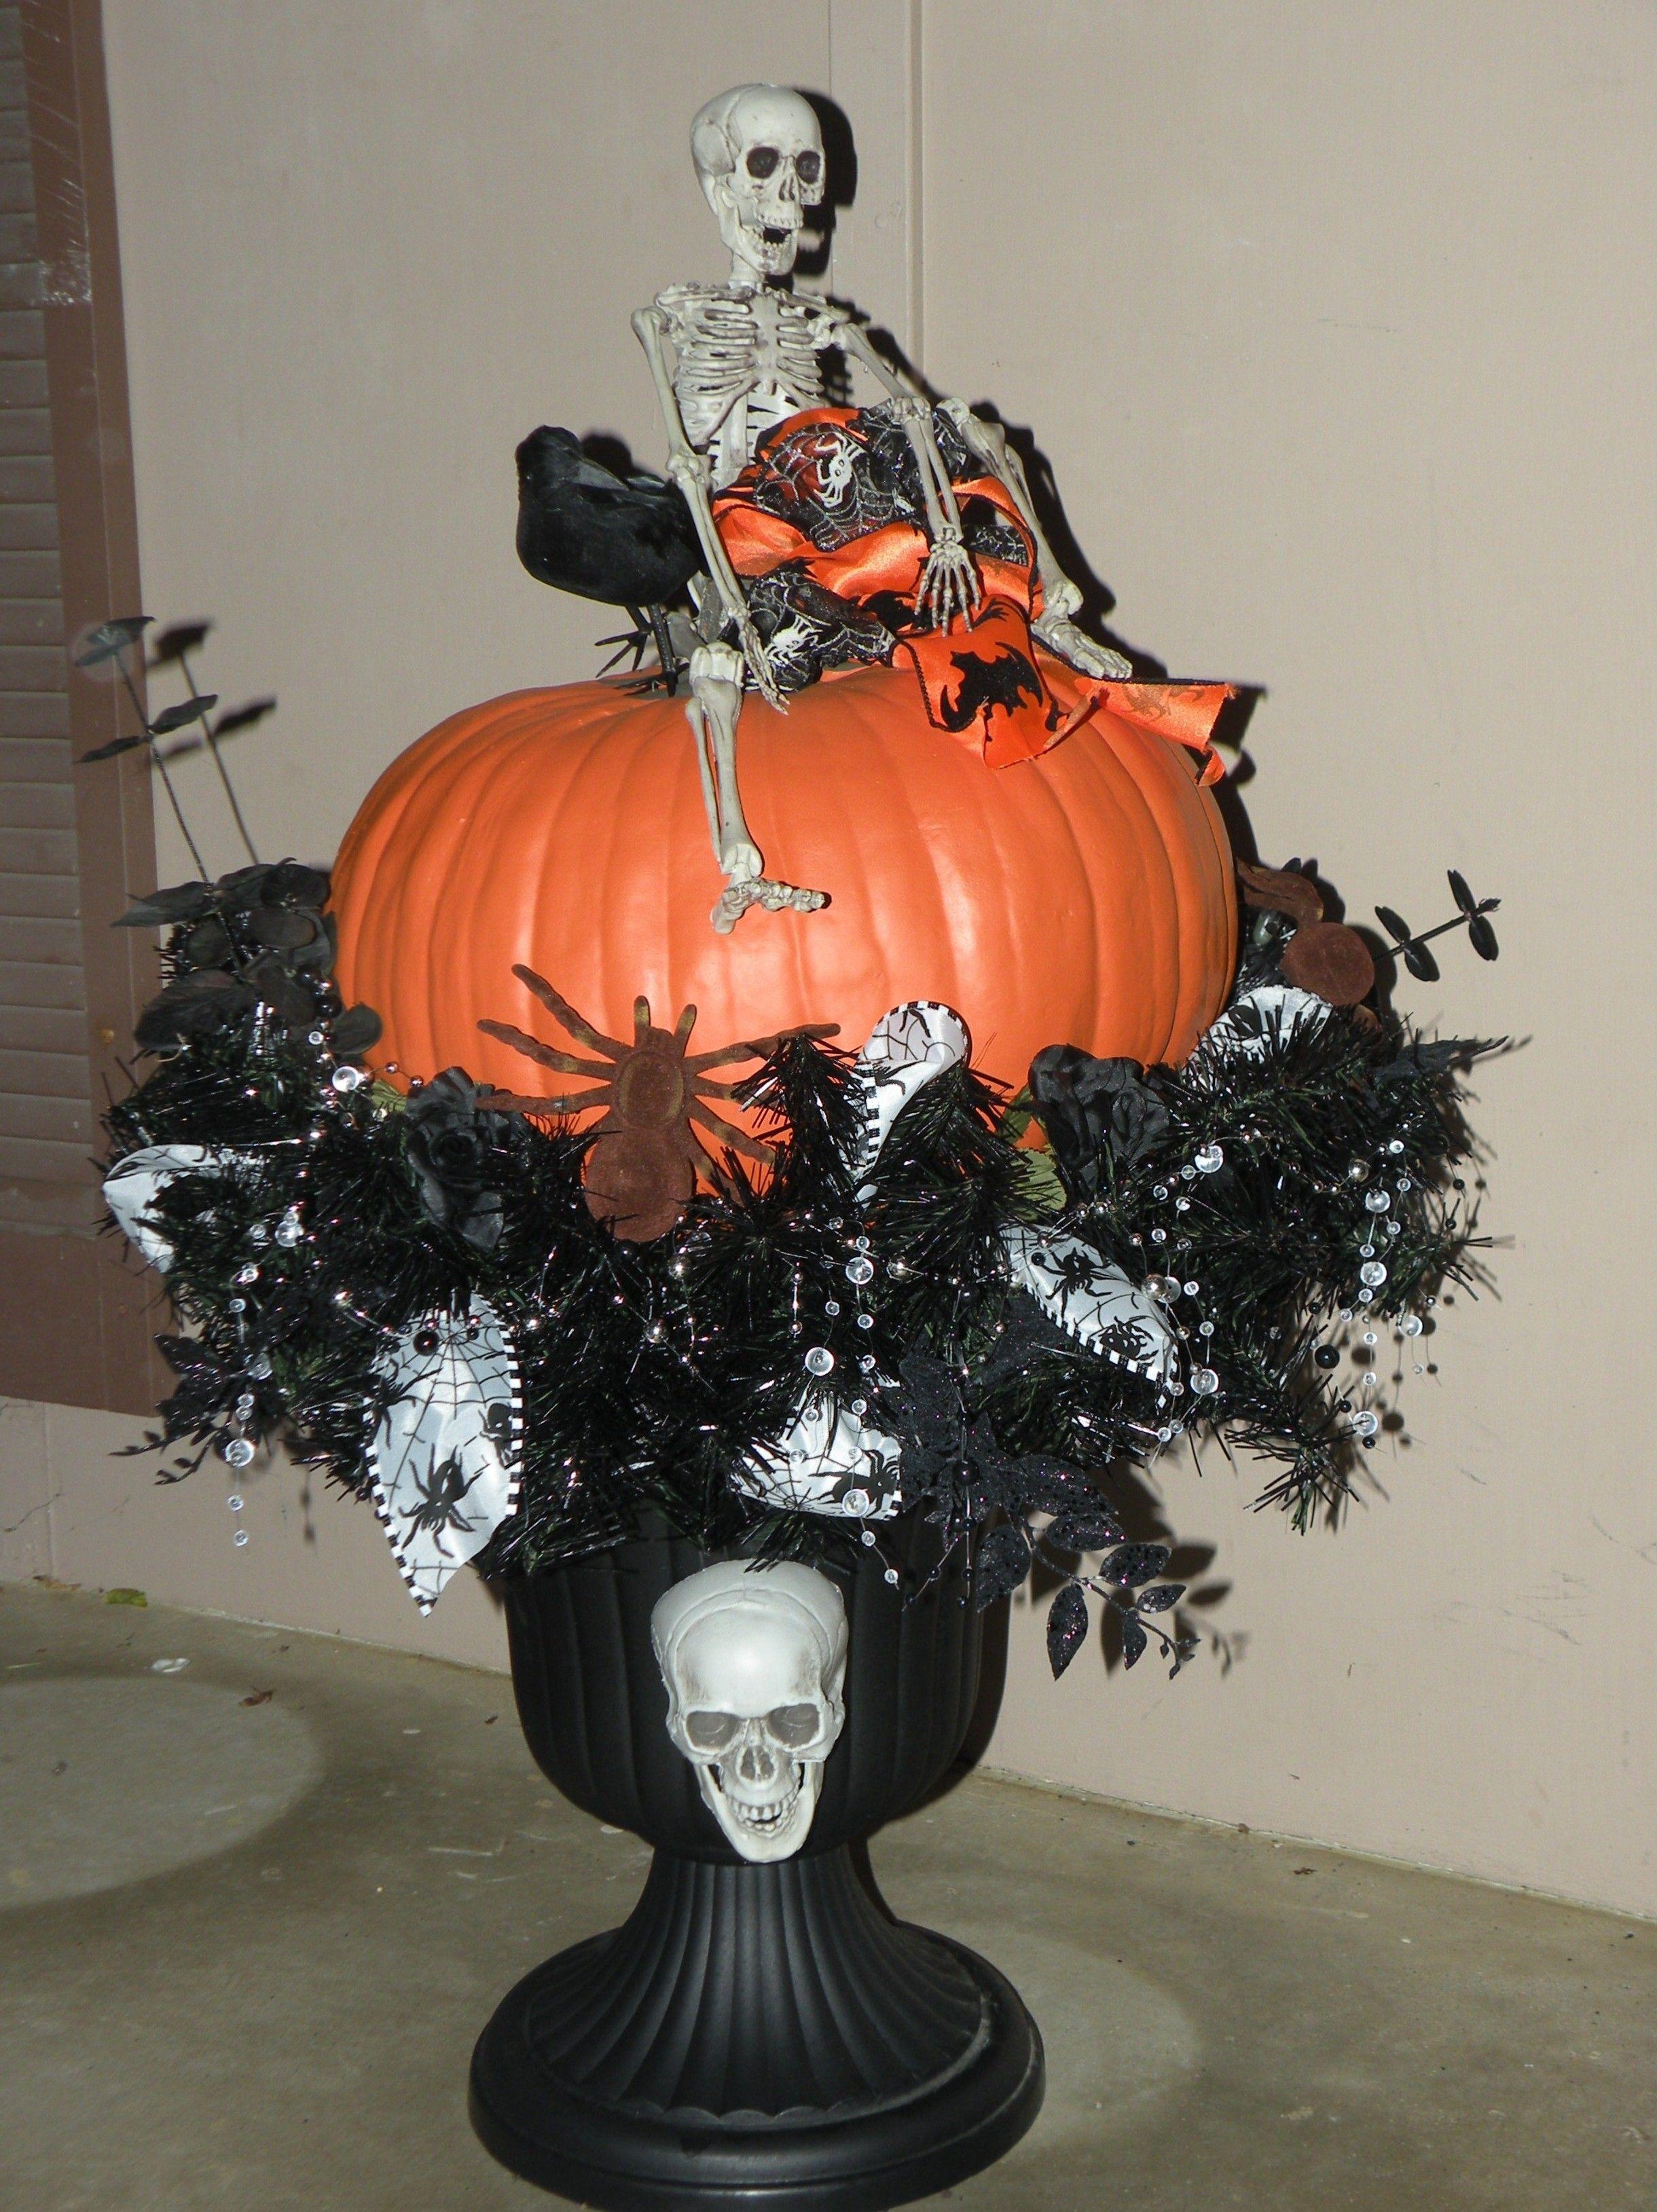 Halloween Urn Decorations Black Urn Fake Pumkin Spray Painted Black Pine Wreath And